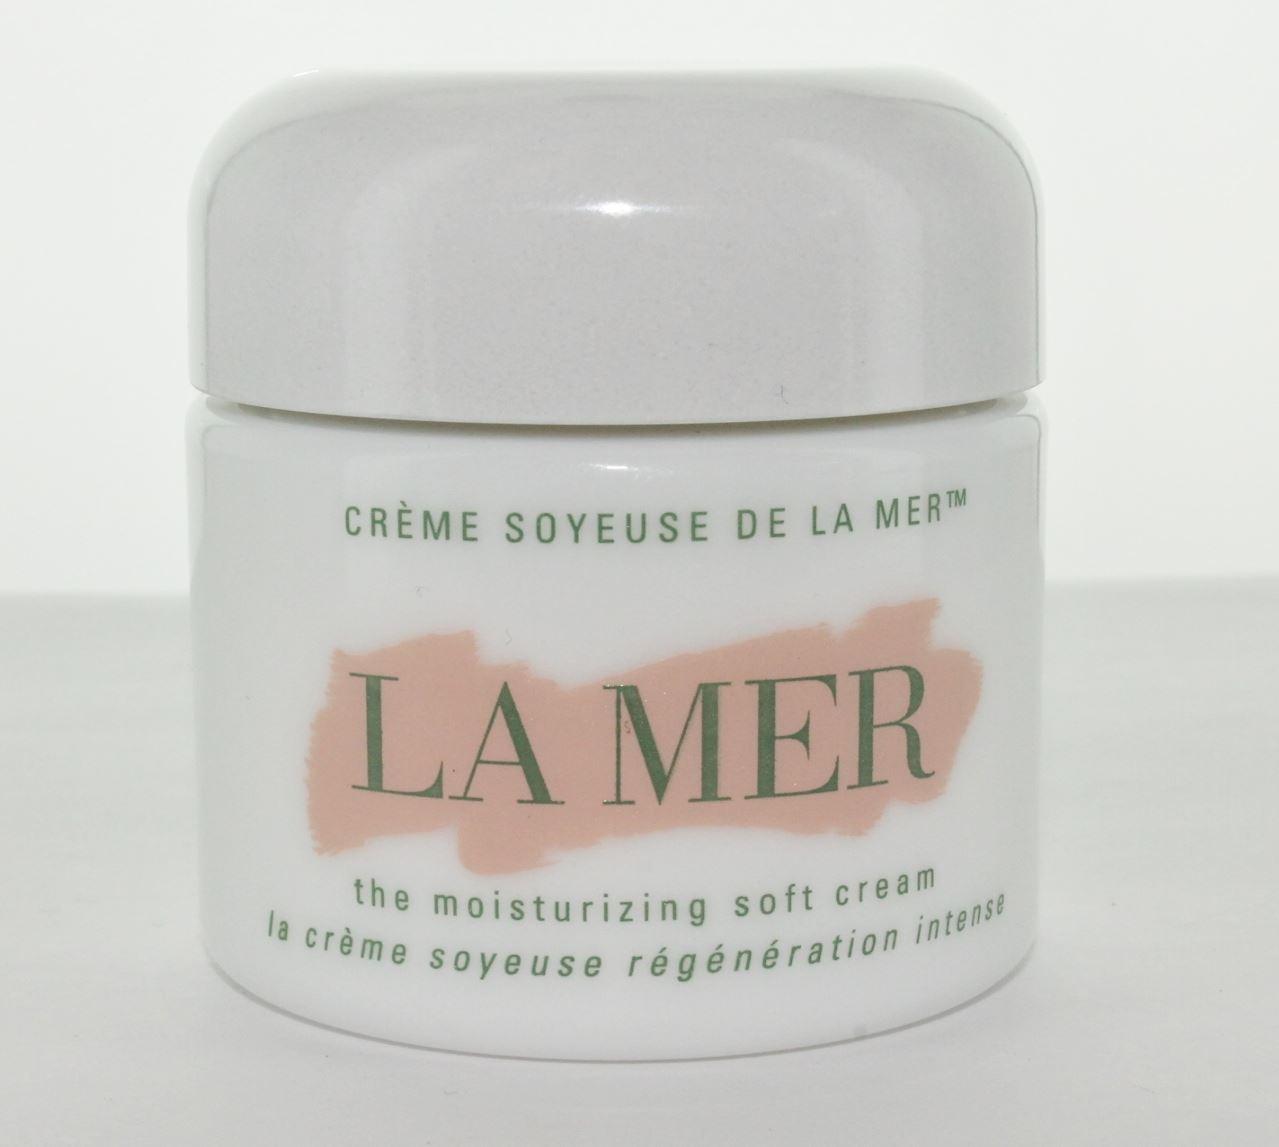 creme de la mer the moisturizing soft cream 2 oz 60 ml new unboxed ebay. Black Bedroom Furniture Sets. Home Design Ideas